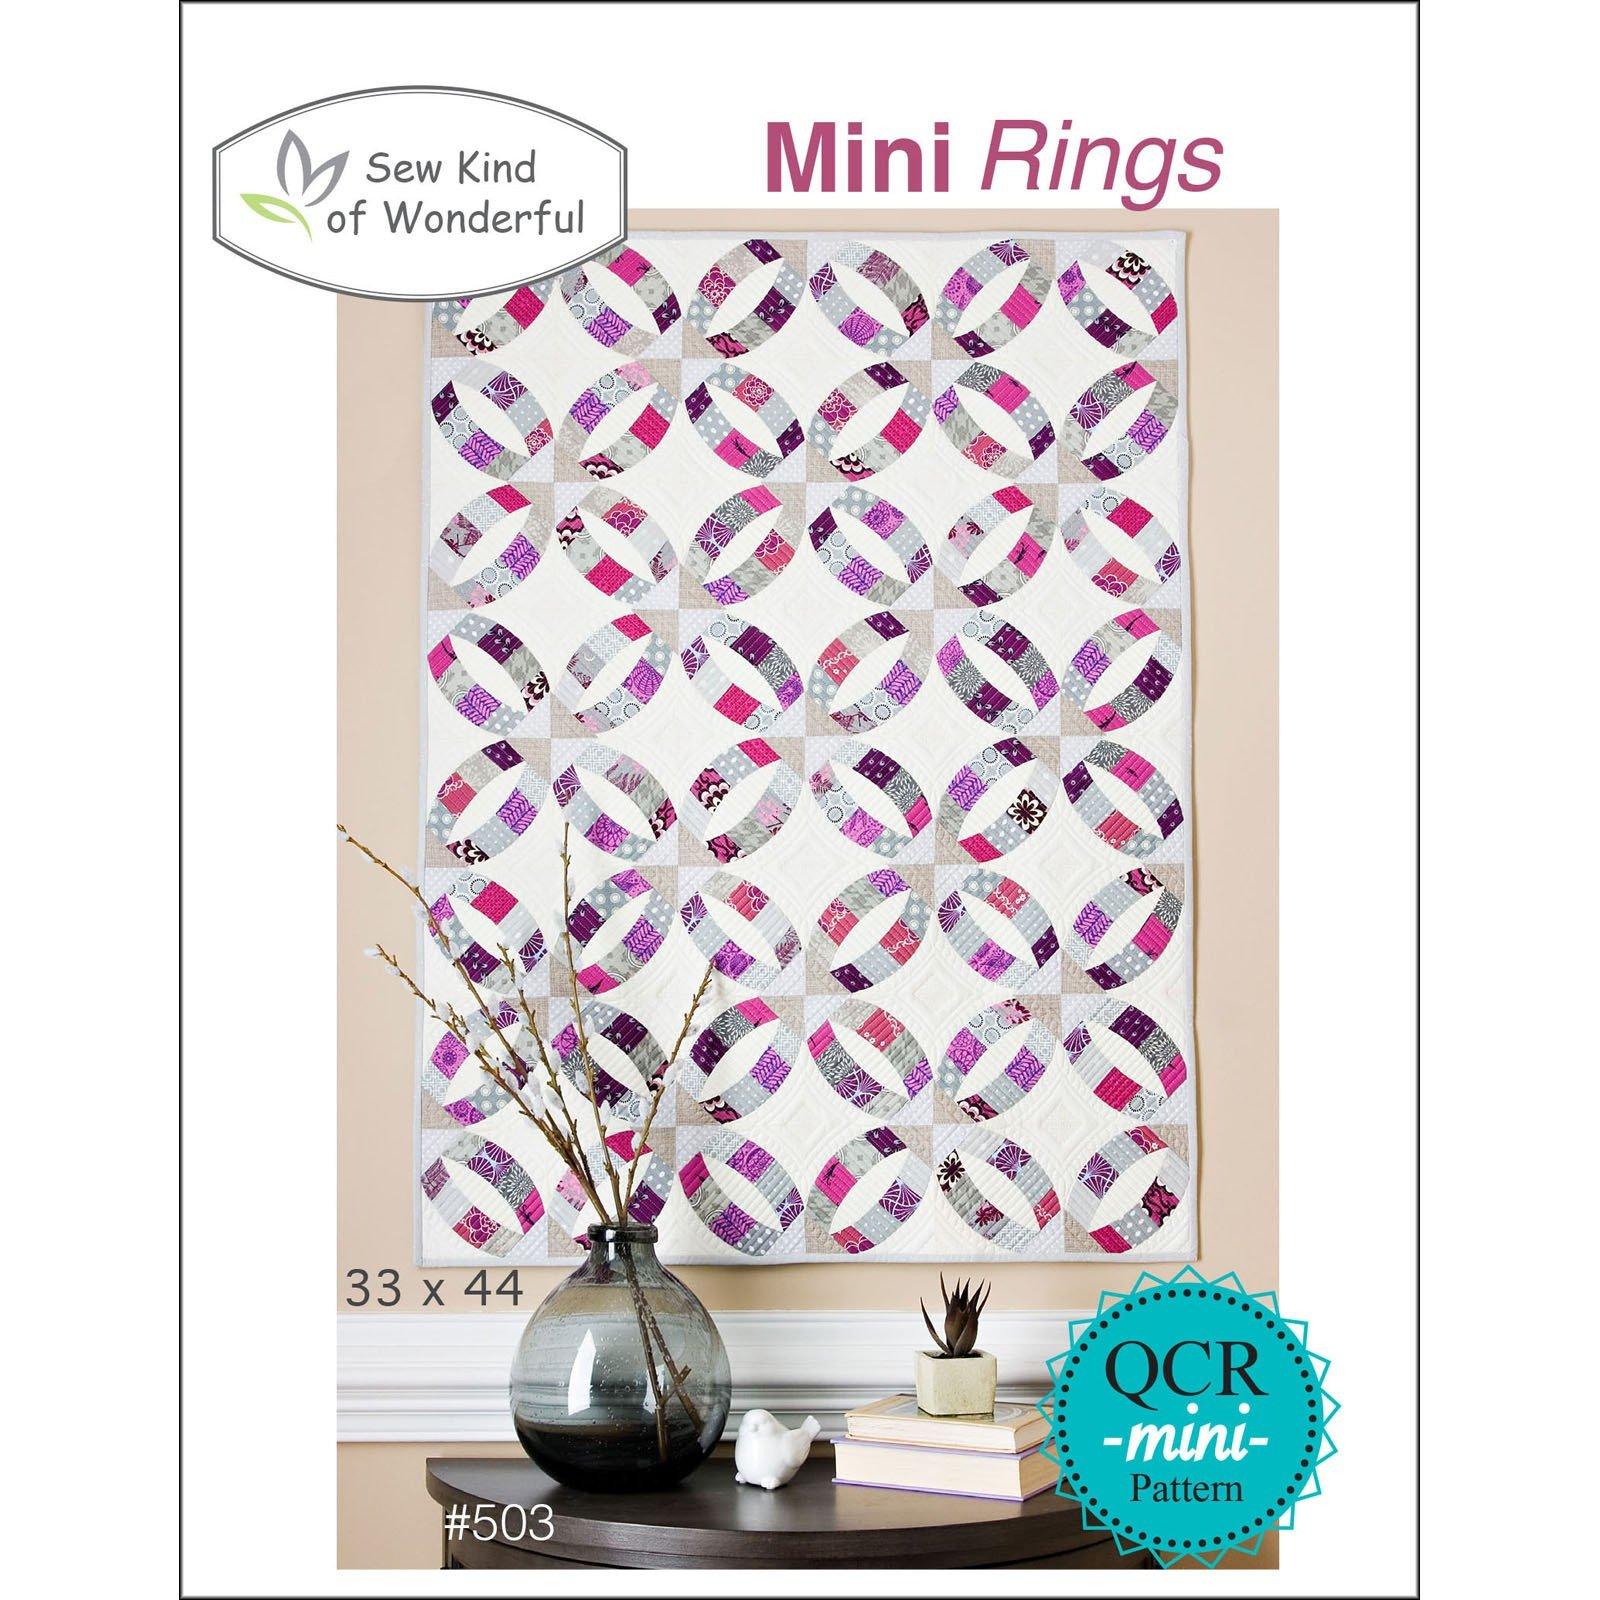 Mini Rings Quilt Pattern